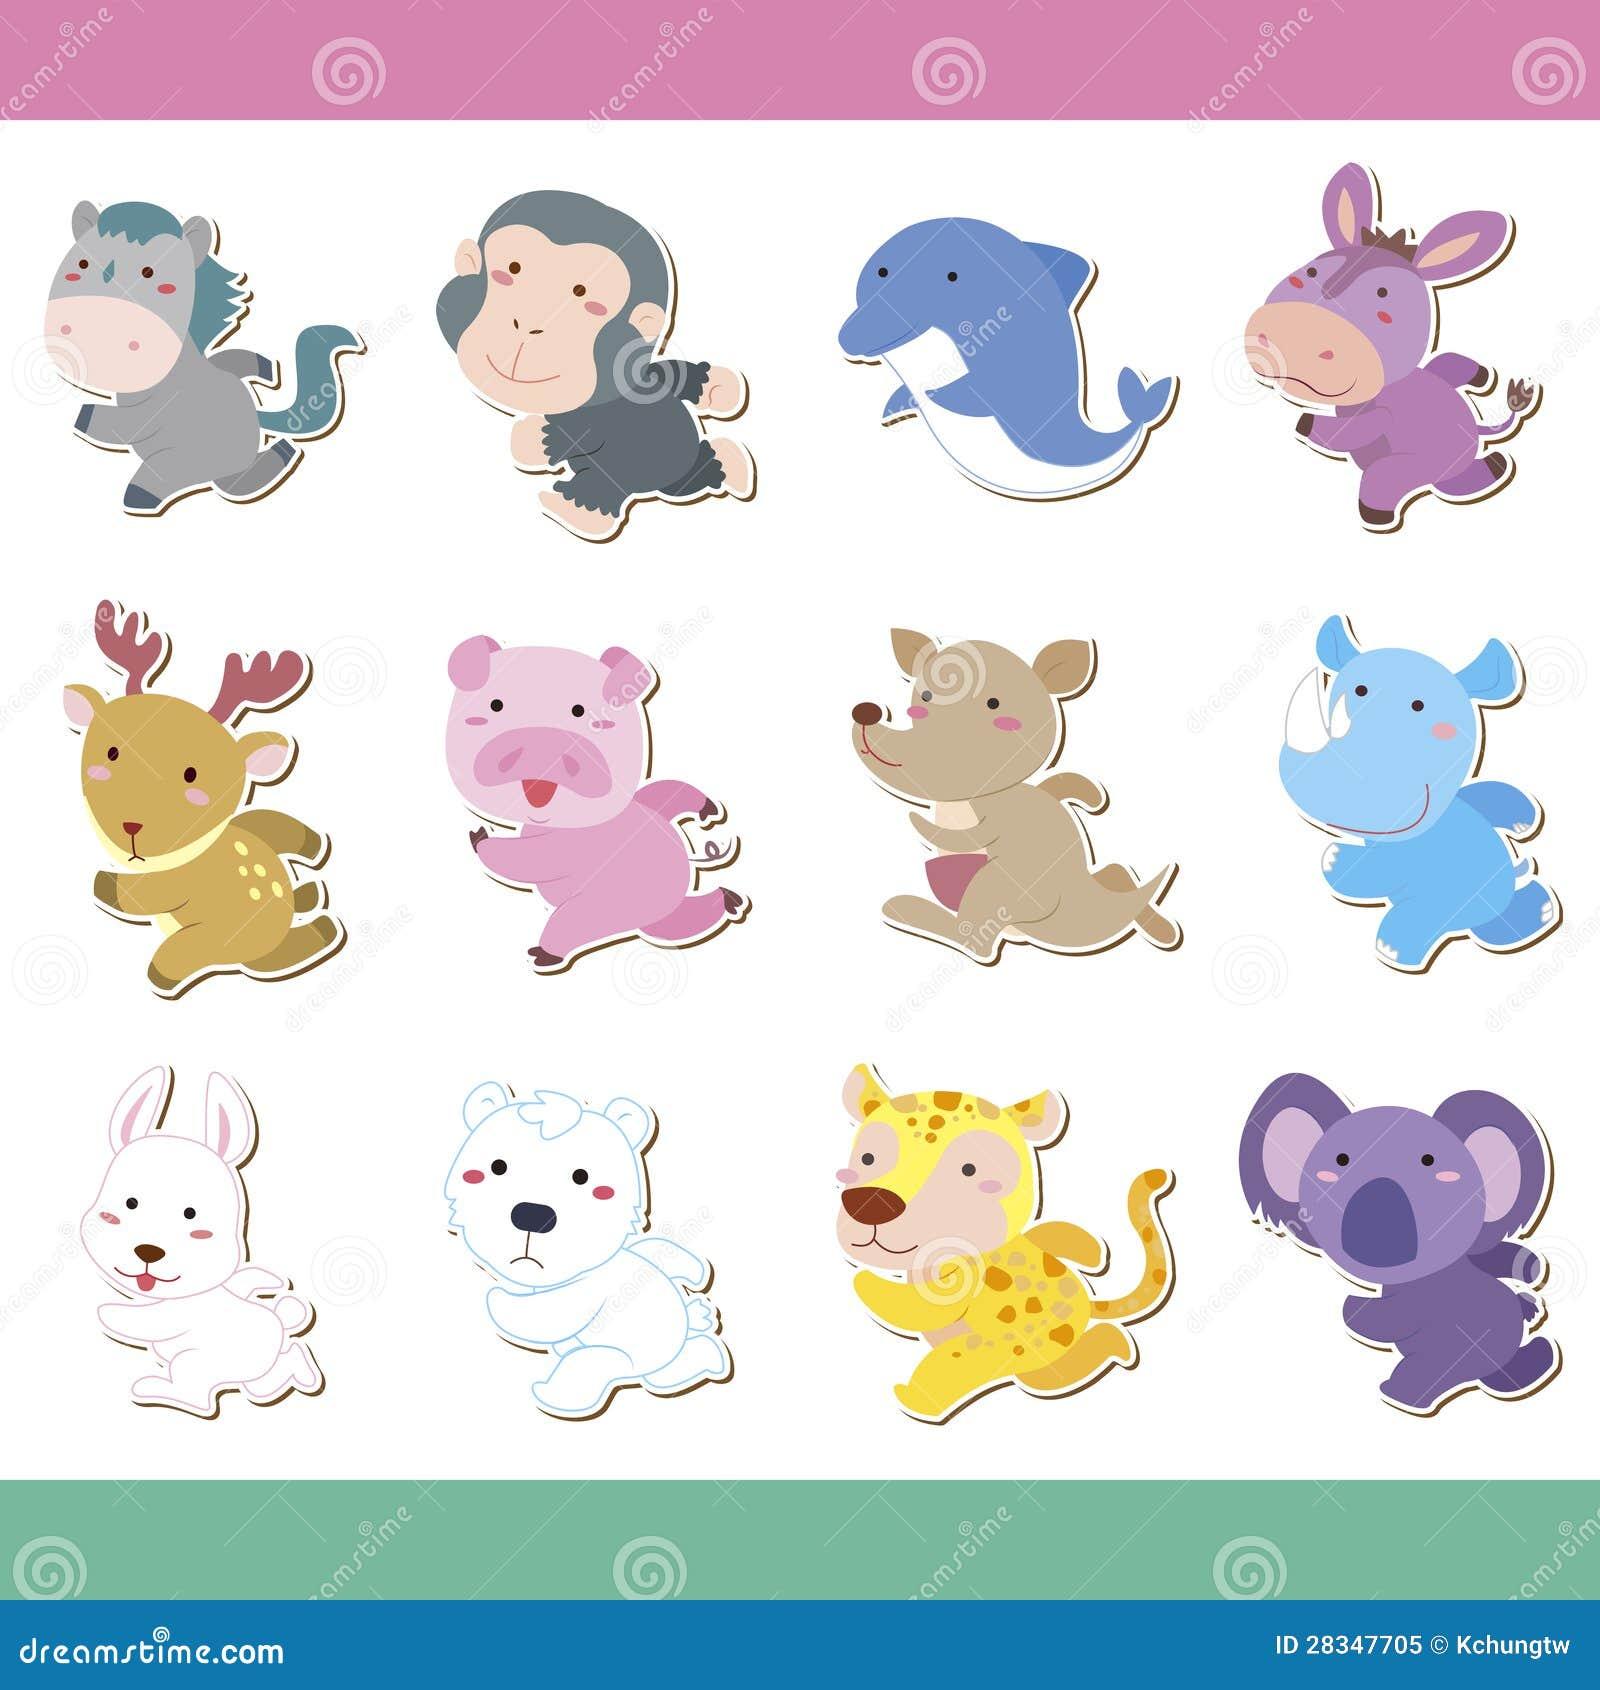 Pokemon 4k Wallpaper in addition Jungle Animal Wallpaper also Funny 1080p Wallpaper likewise Easy Animal Drawings 11 moreover Safari Animal Clipart. on cartoon animal safari